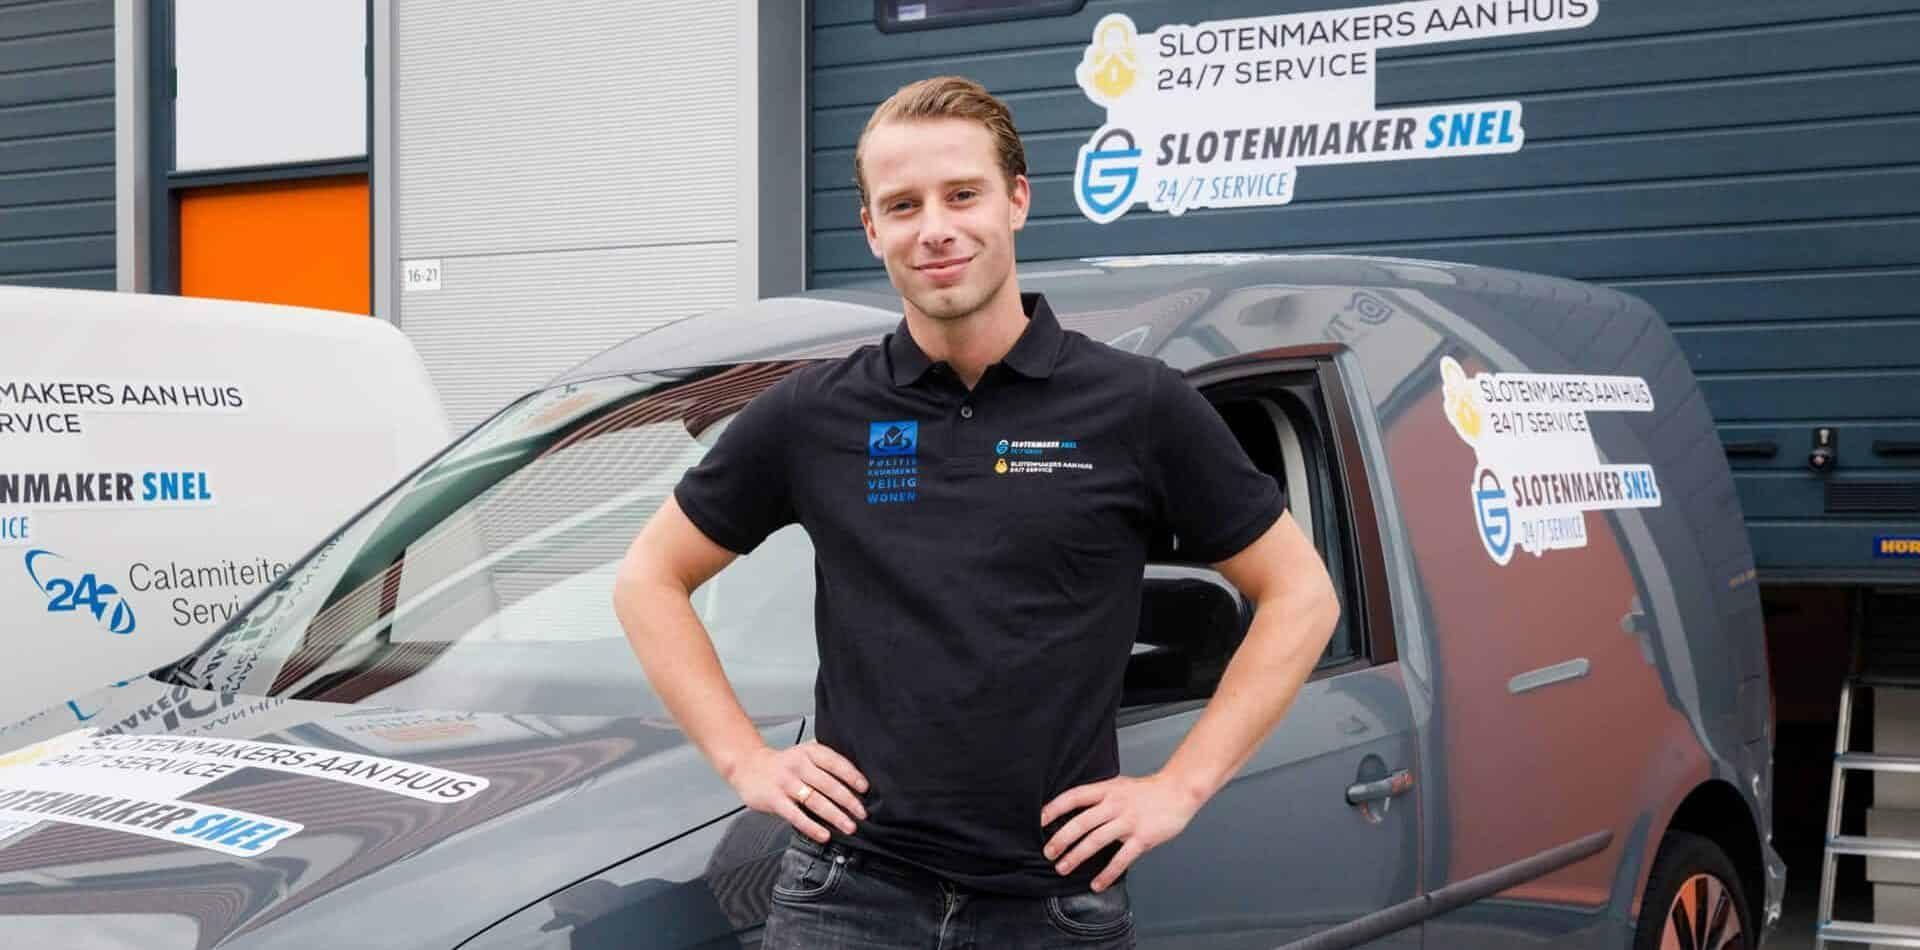 Slotenmaker Roermond